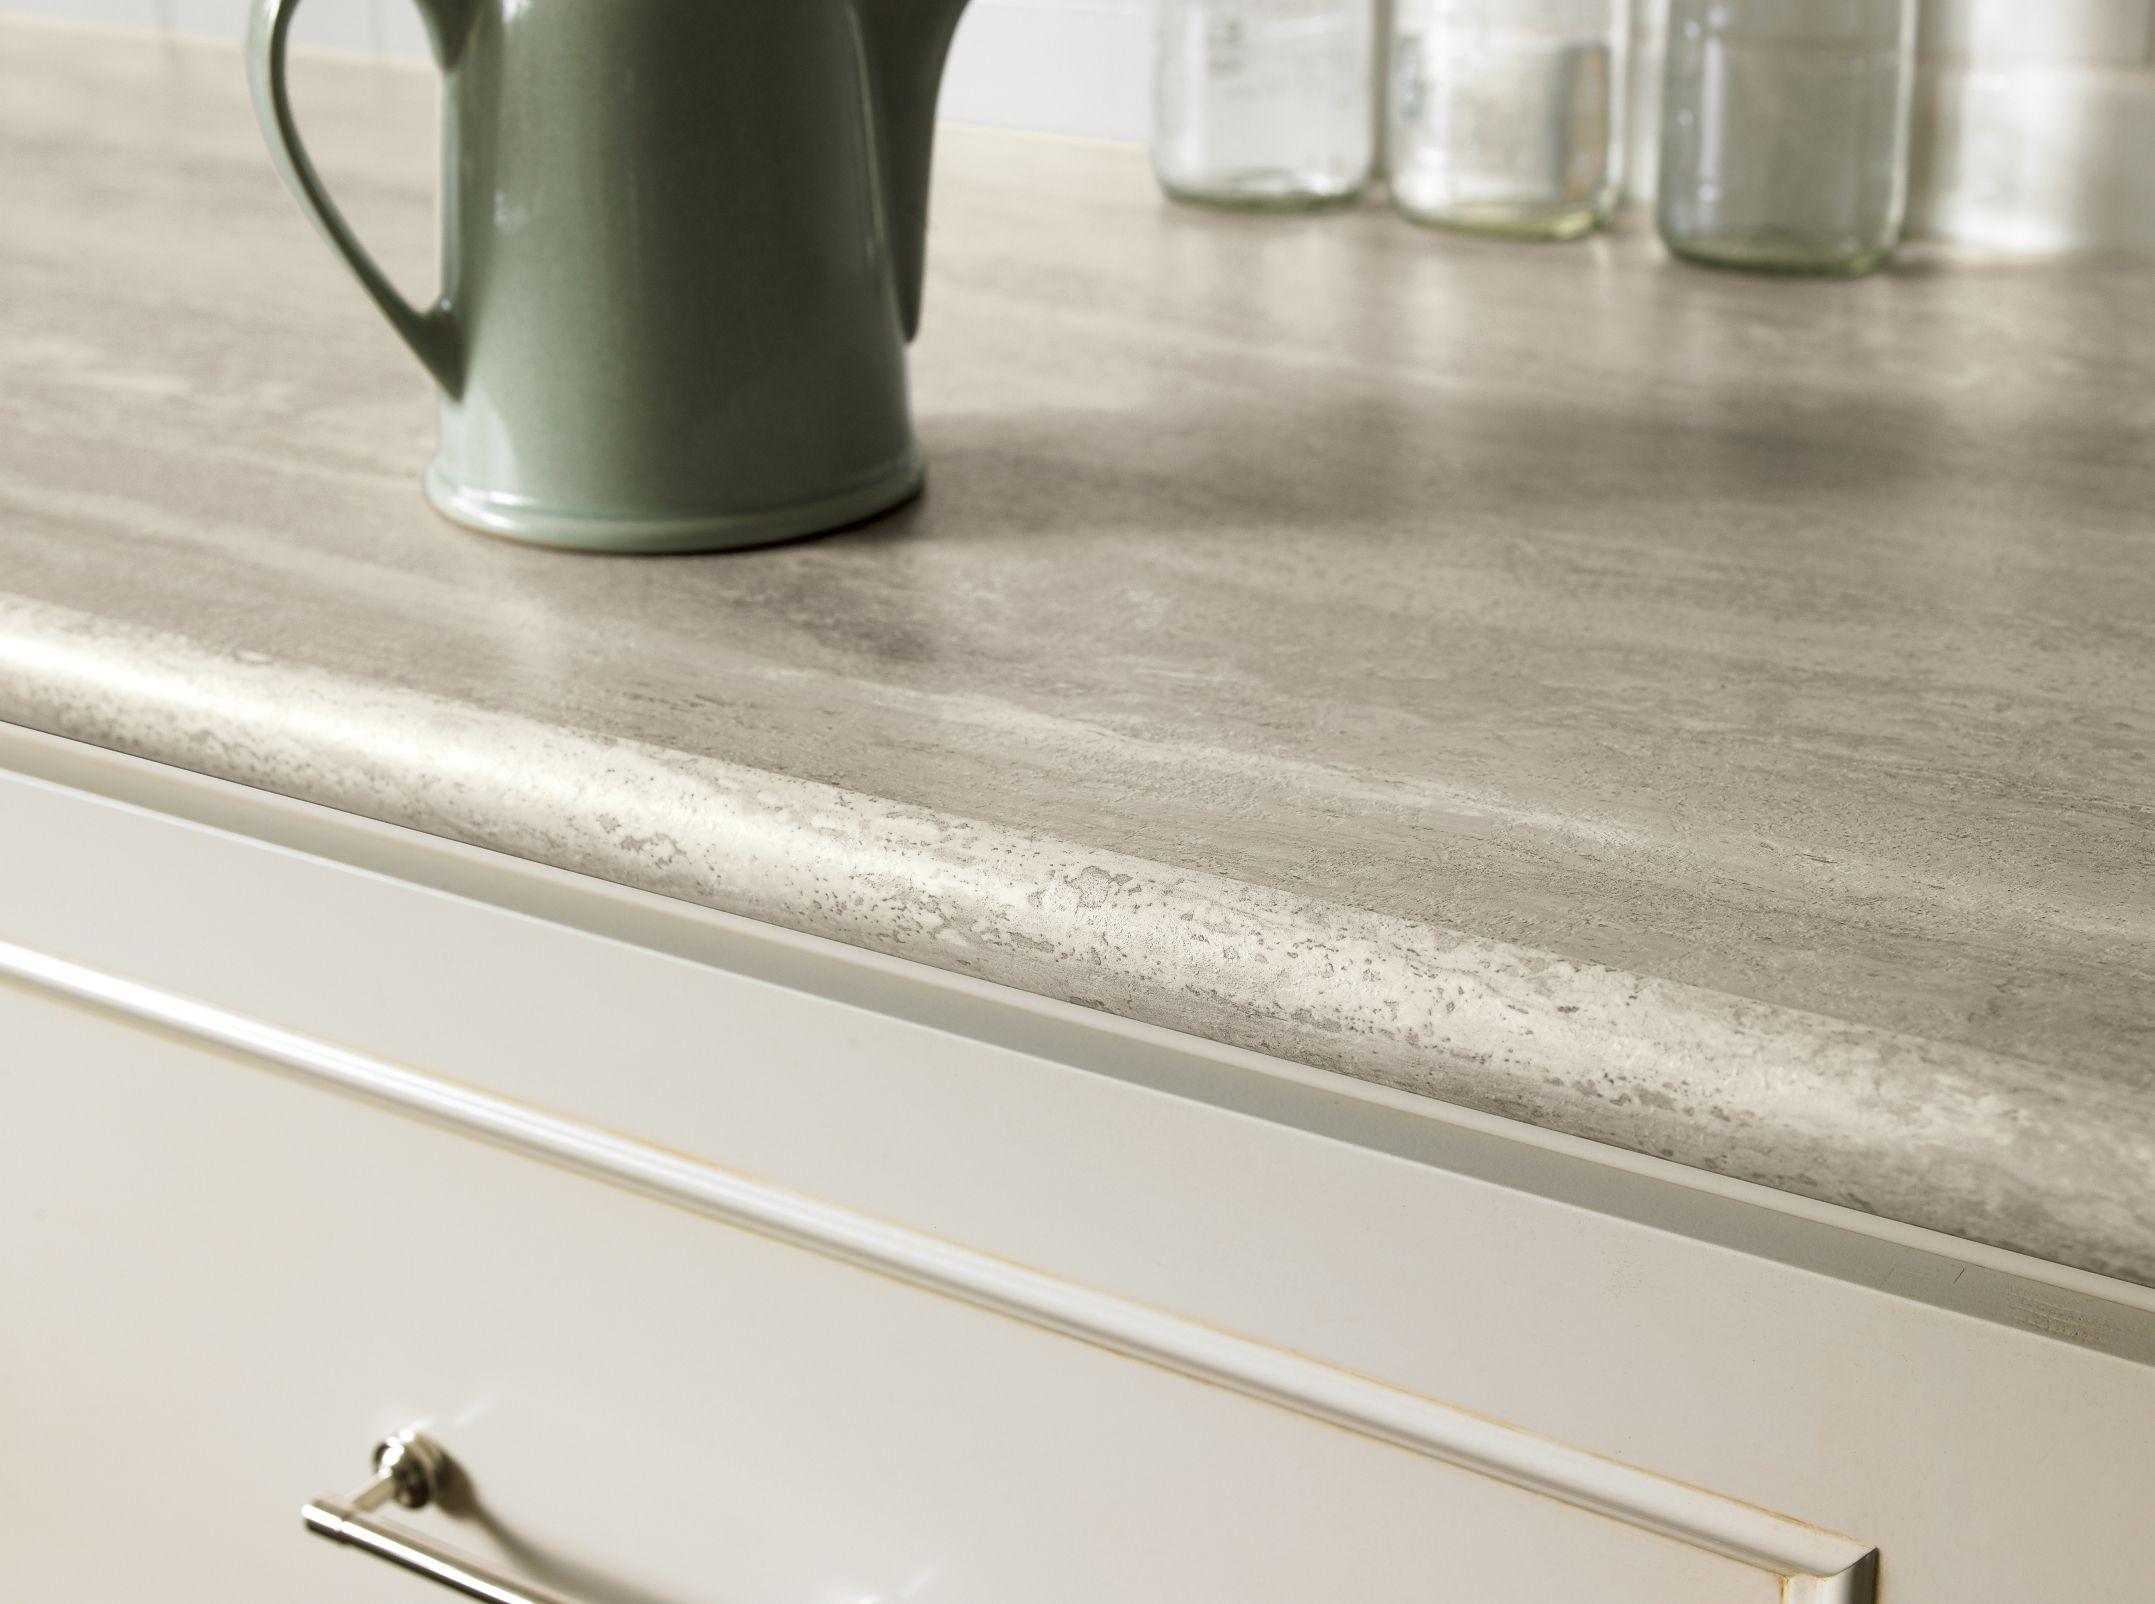 countertops formica kitchen countertops Formica Travertine Silver fx Kitchen Countertop